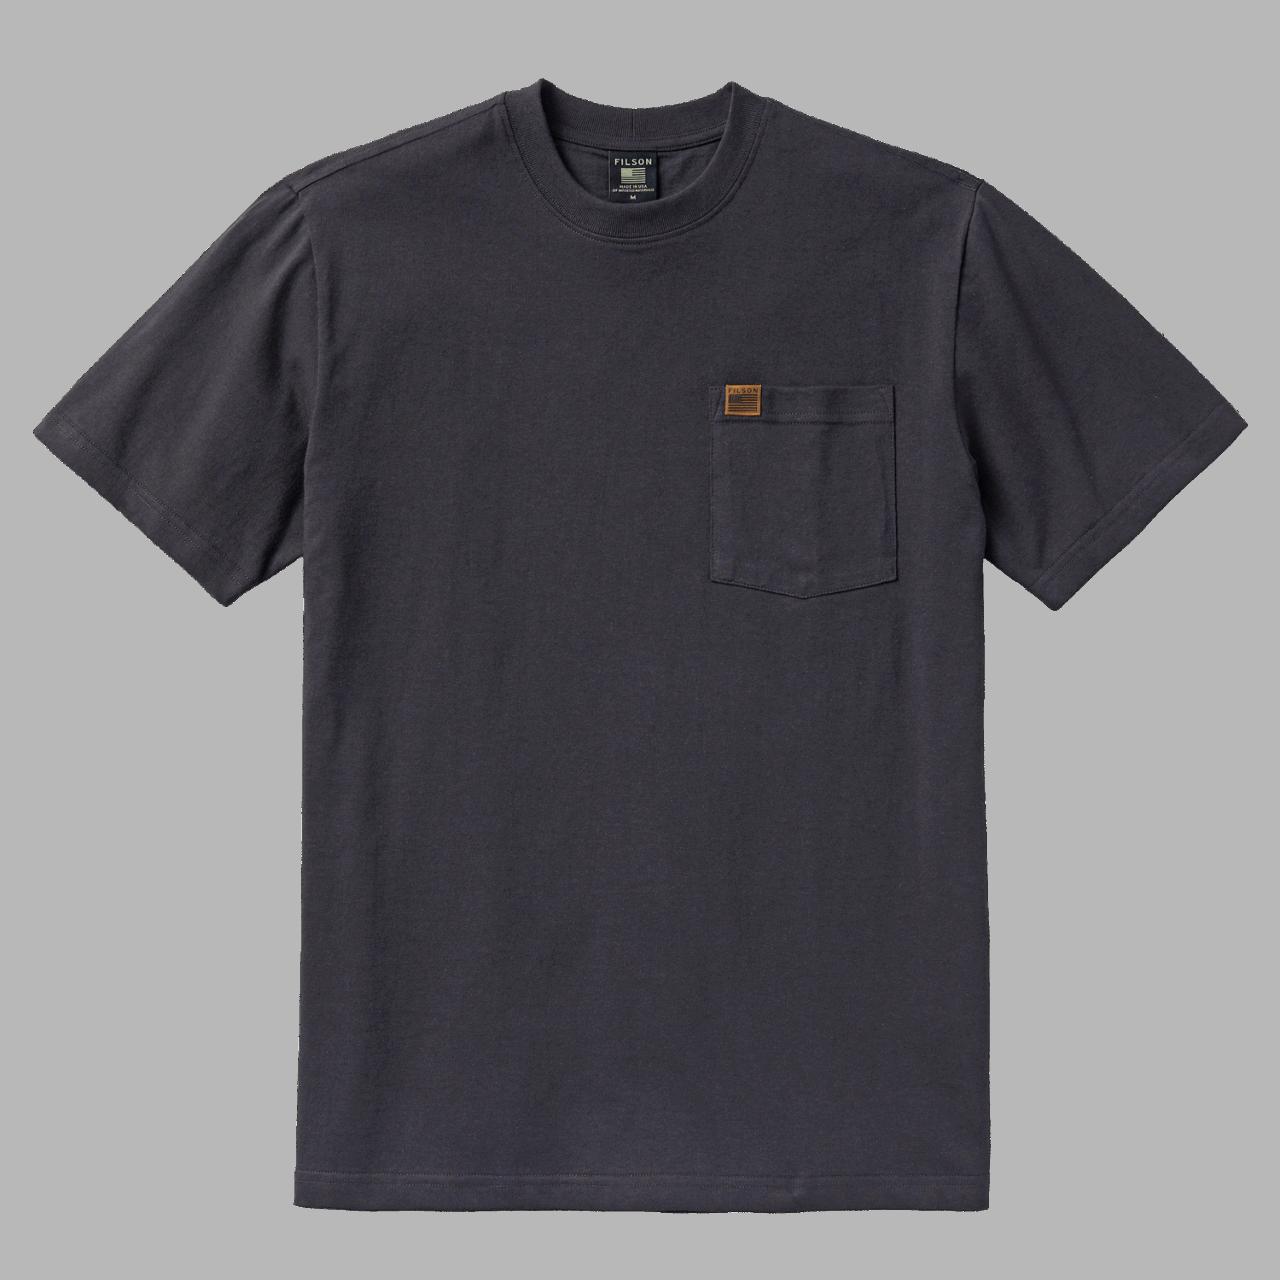 Filson Pioneer Solid One Pocket T-Shirt - black